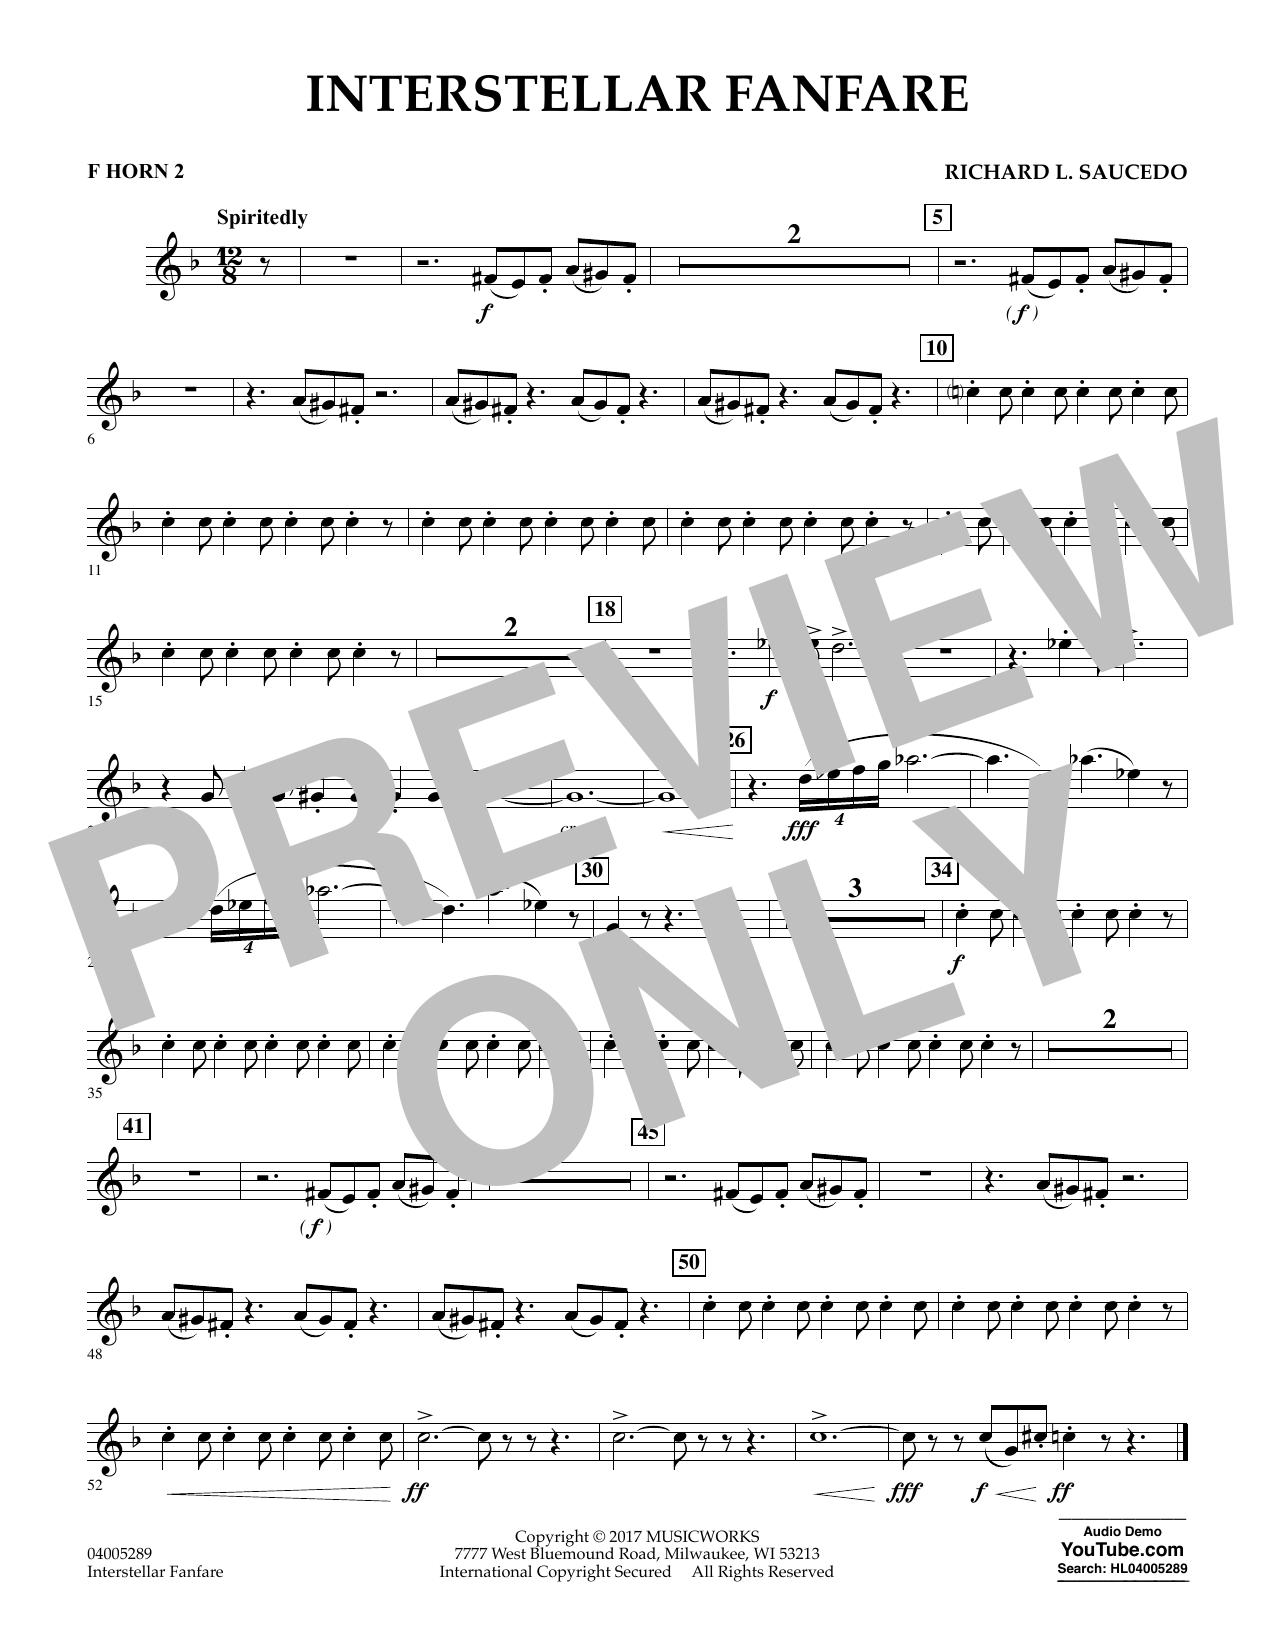 Interstellar Fanfare - F Horn 2 (Concert Band)